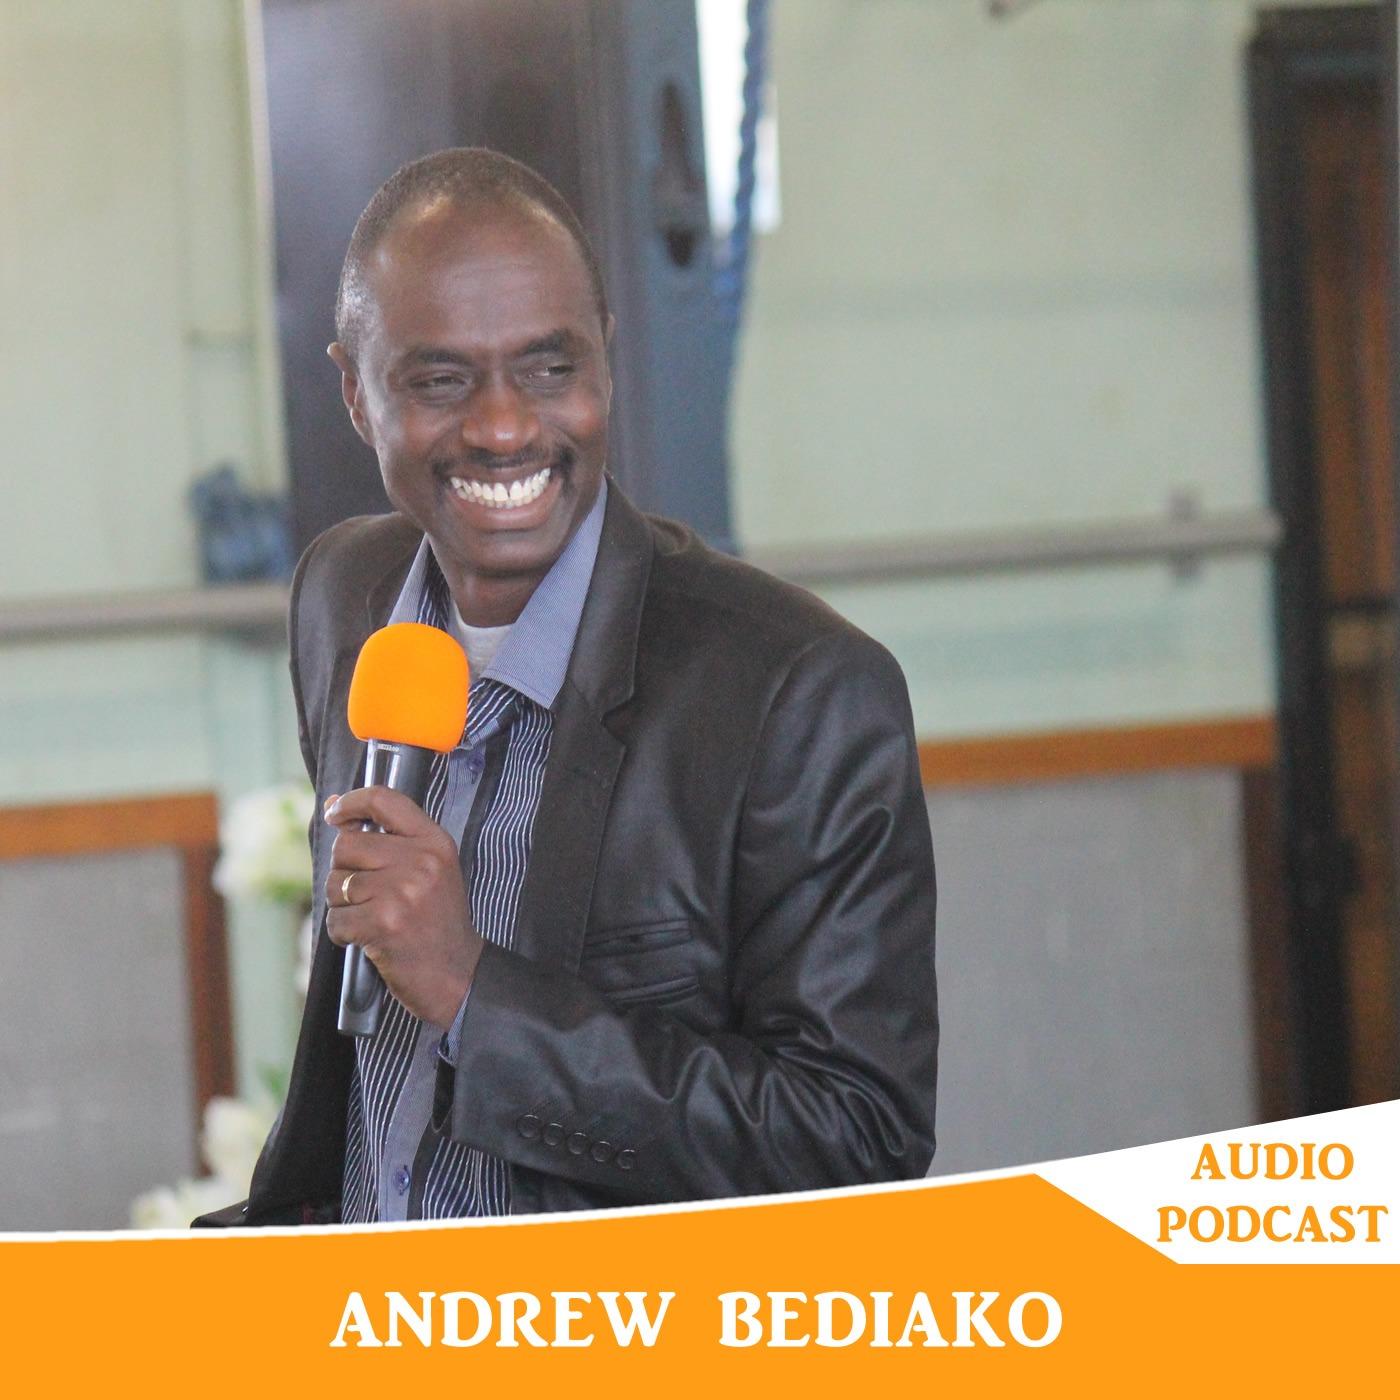 Andrew Bediako Podcast